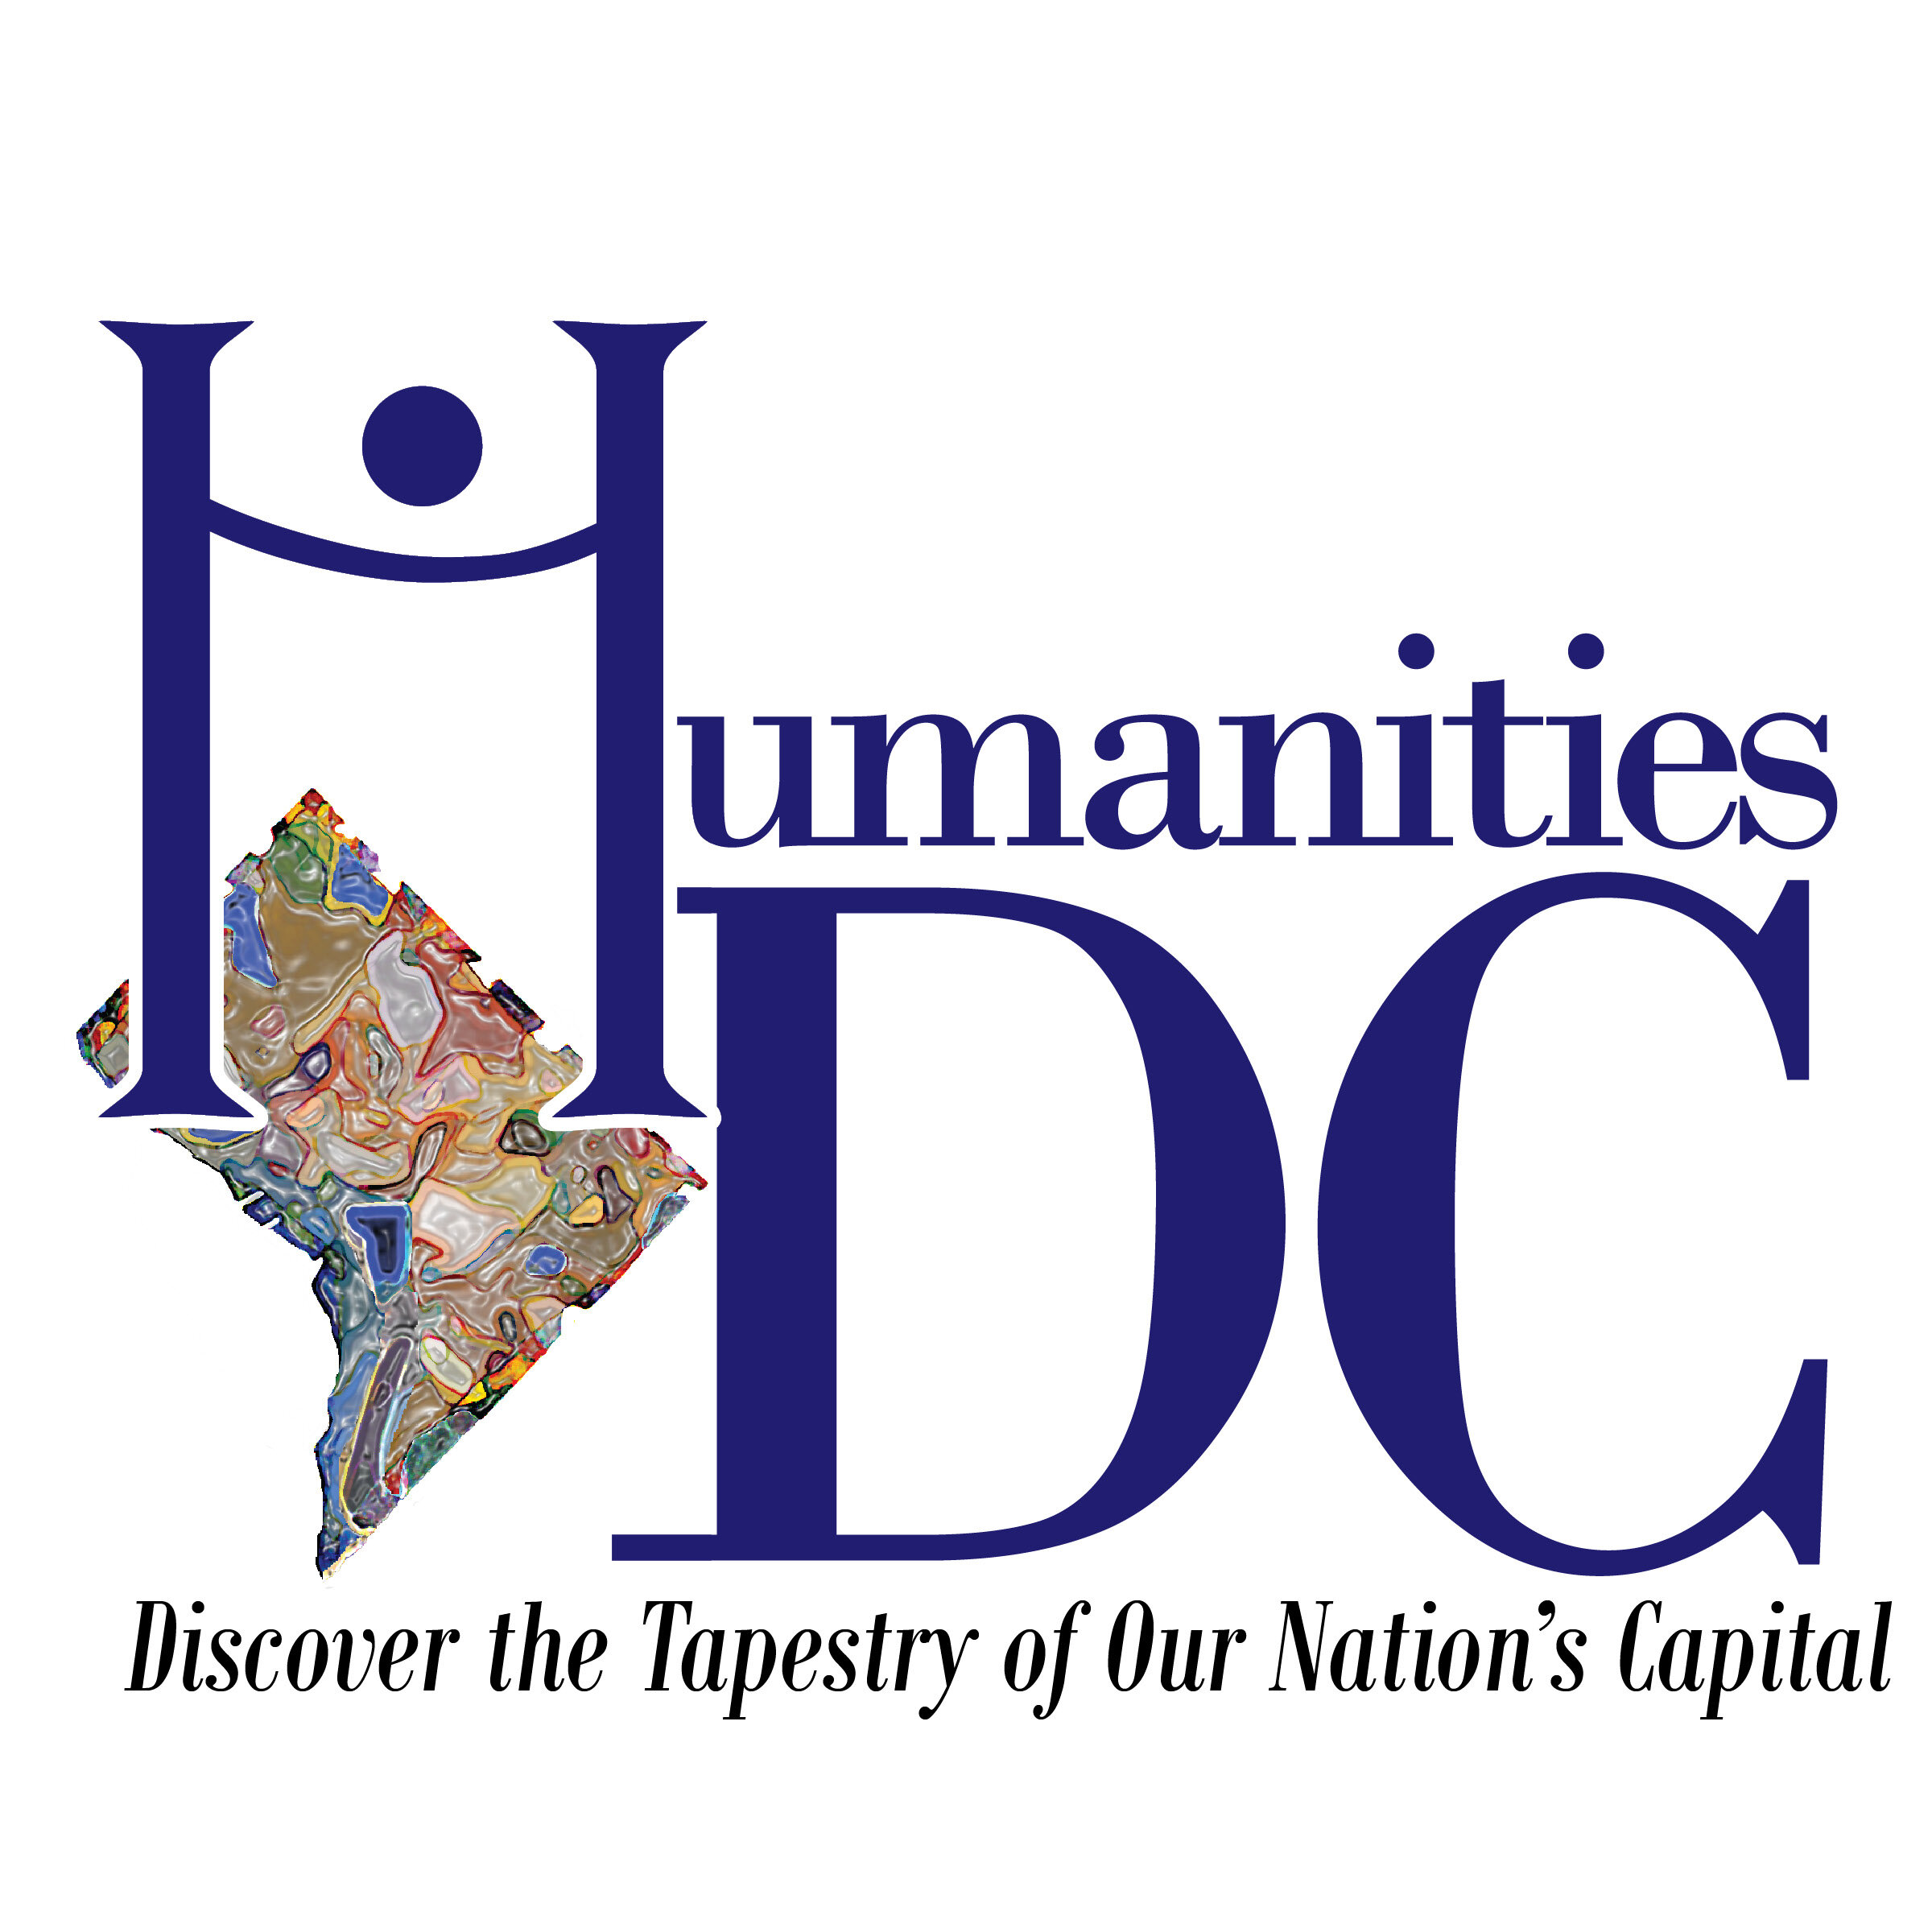 hdc logo with MAP.jpg